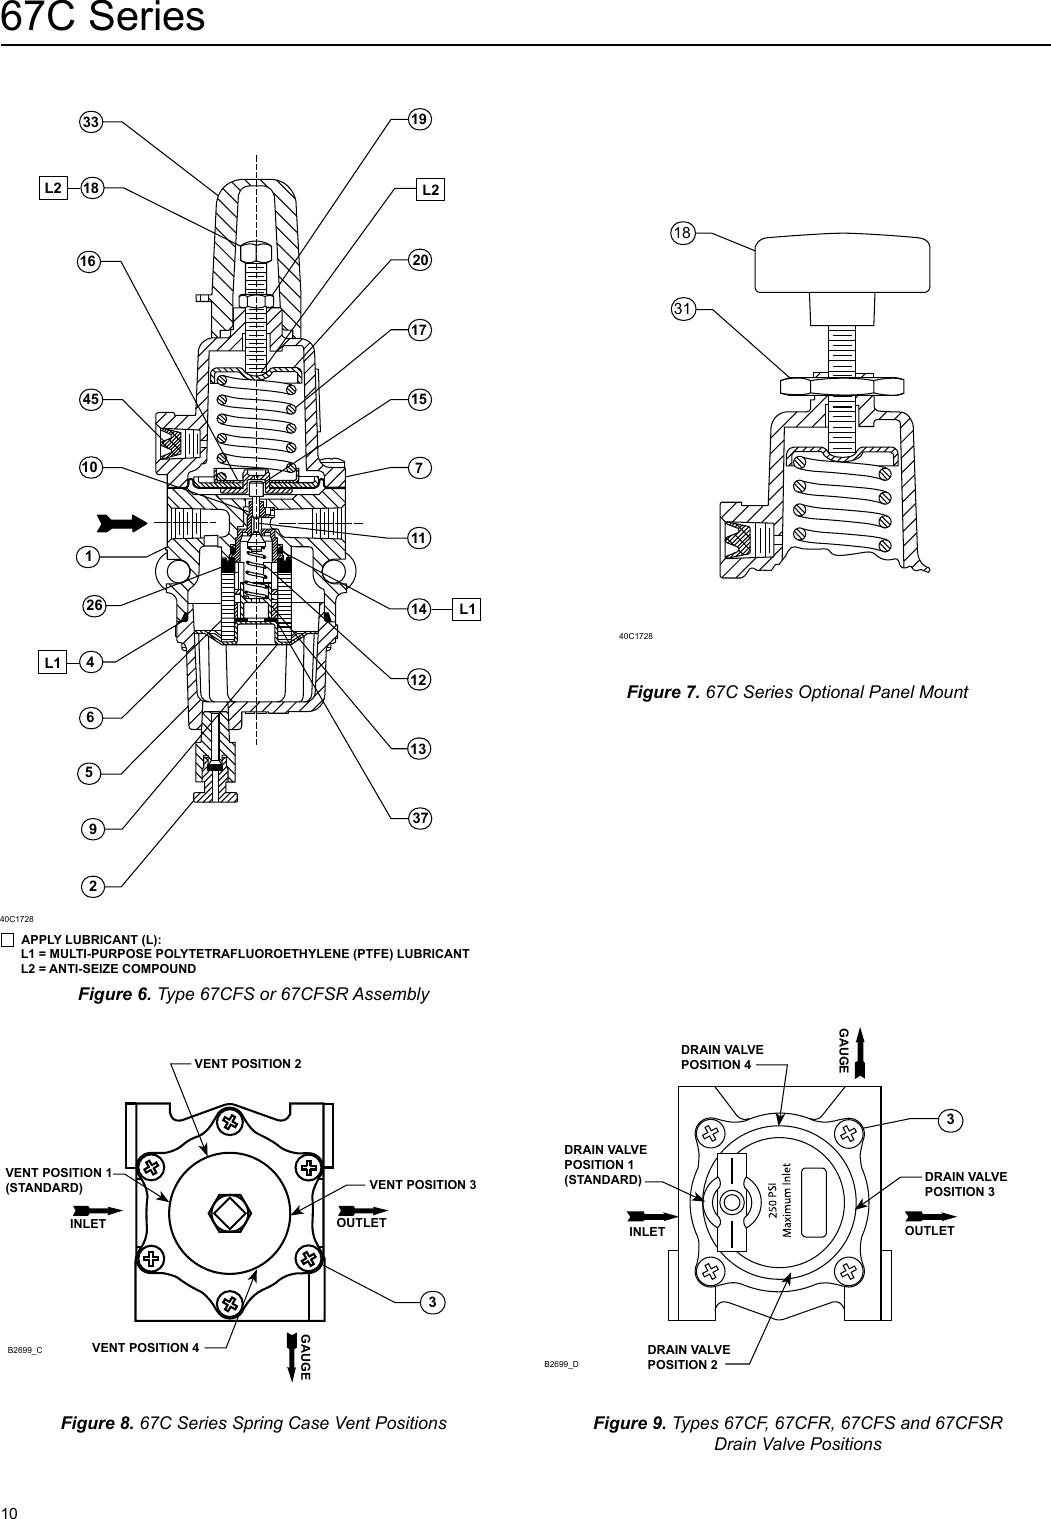 Emerson 67C Series Instrument Supply Regulators